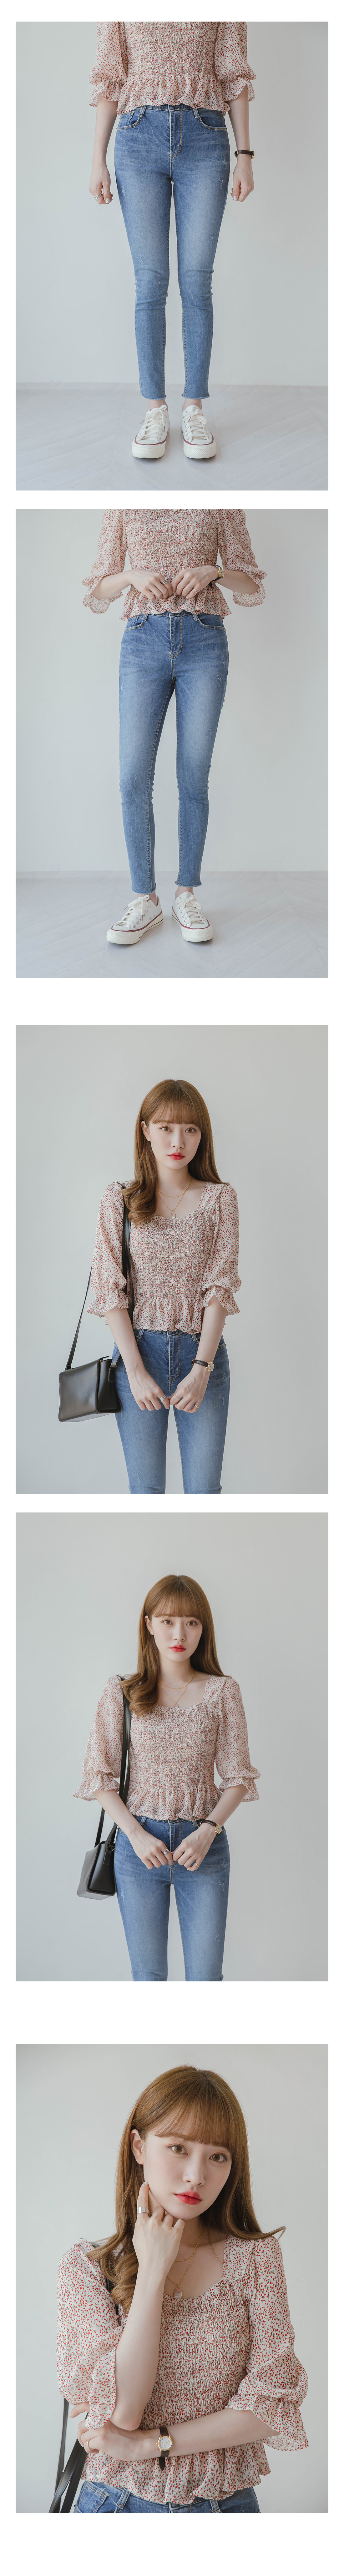 News mock frill blouse